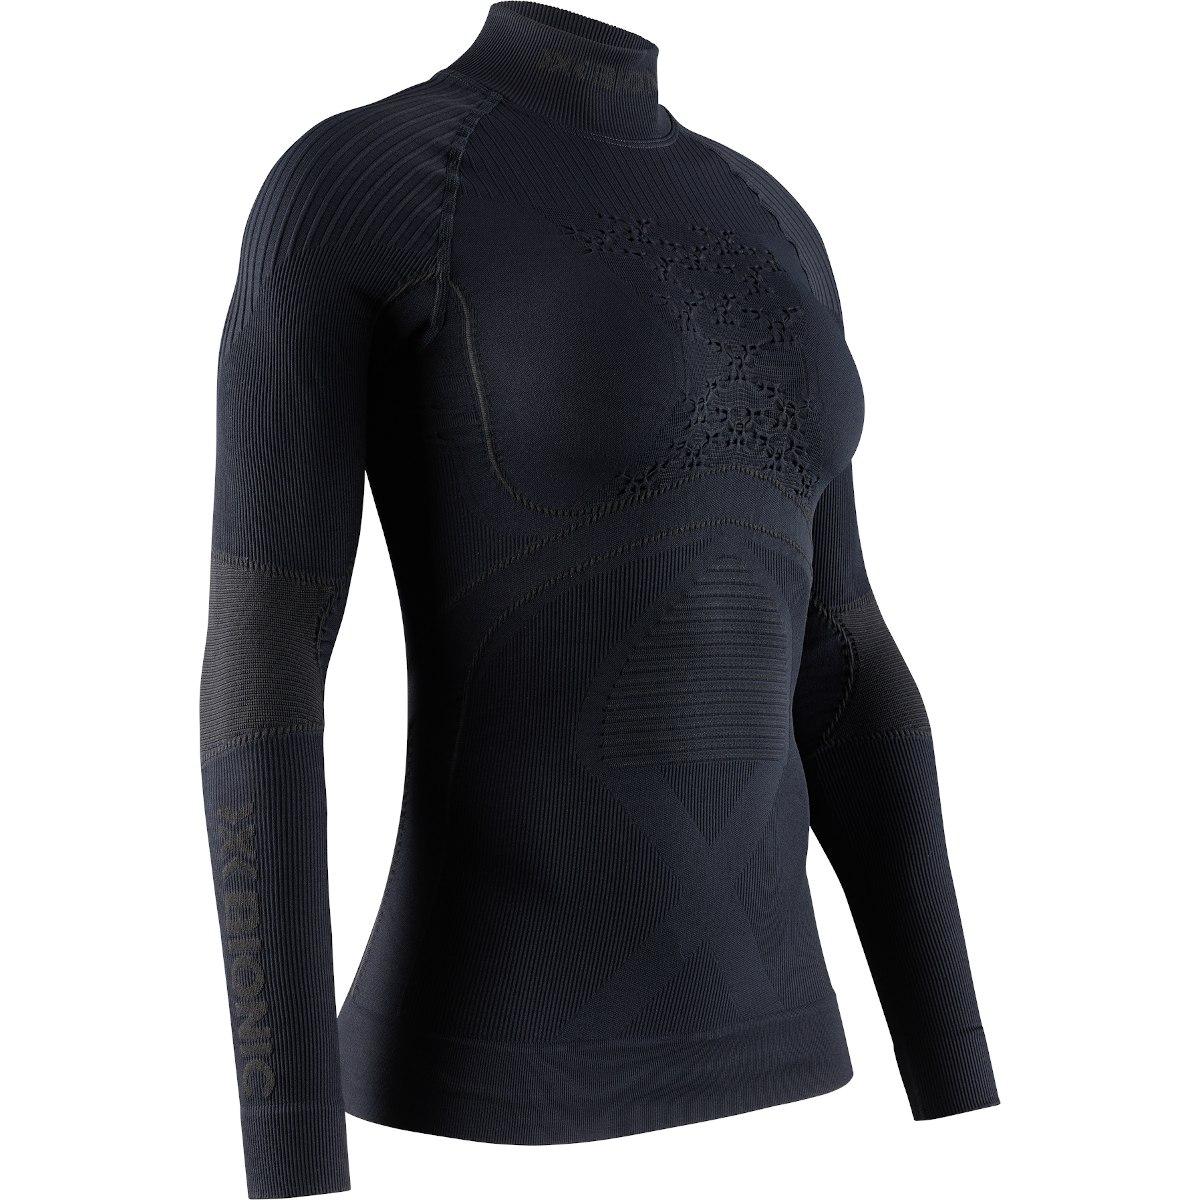 X-Bionic Energy Accumulator 4.0 Turtle Neck Langarm-Unterhemd für Damen - black/black